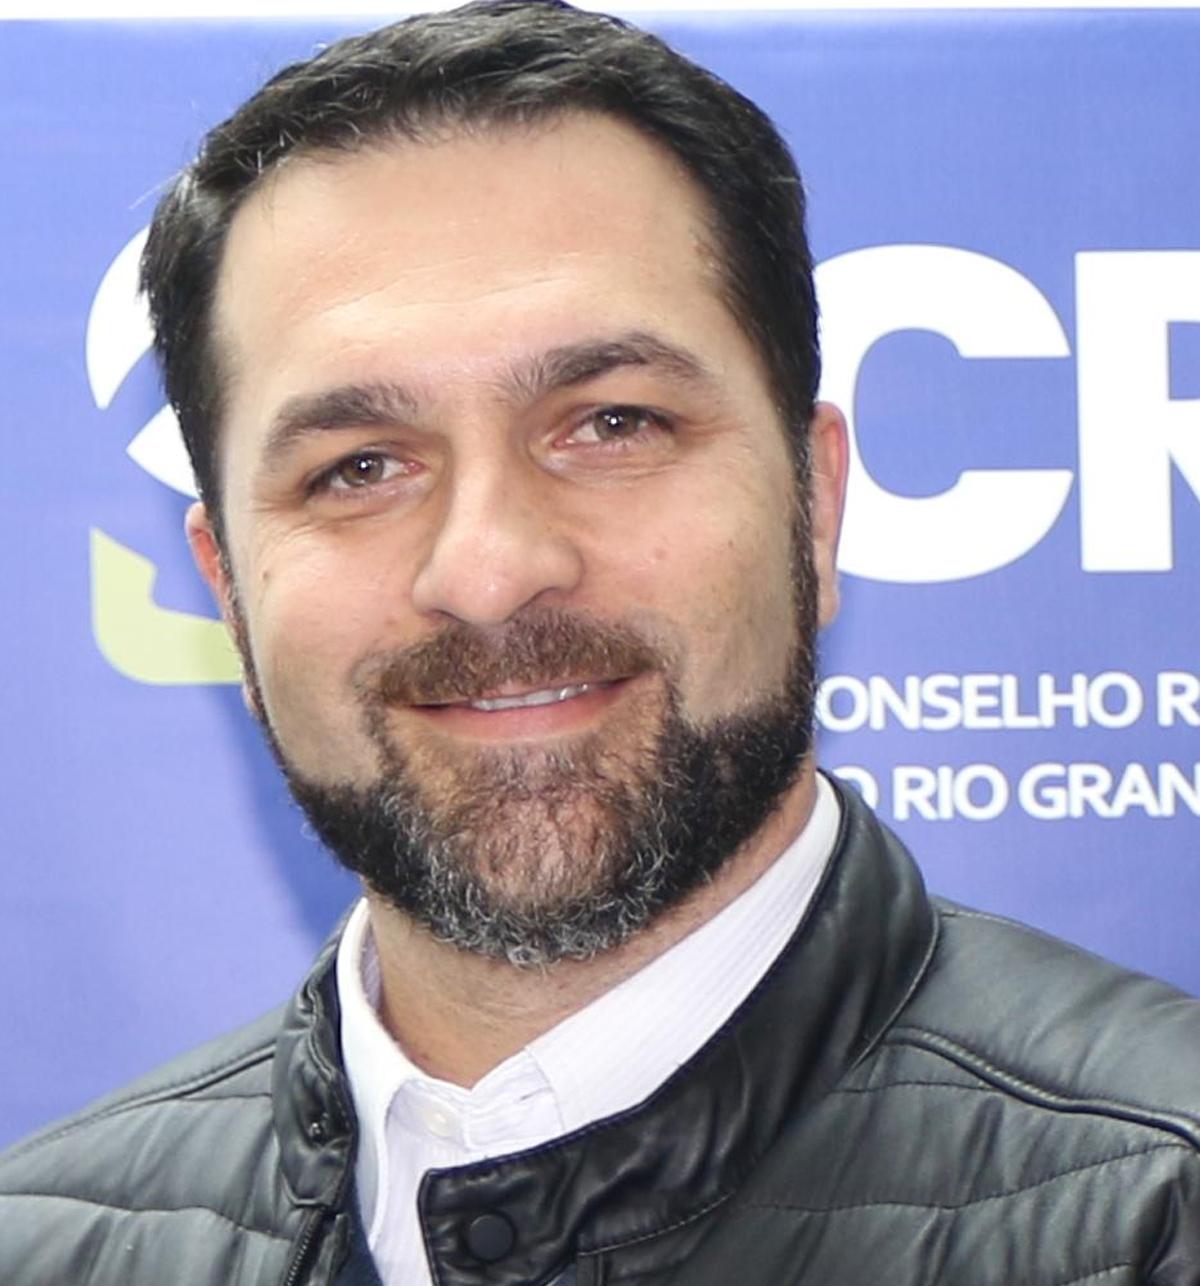 Ricardo Kerkhoff